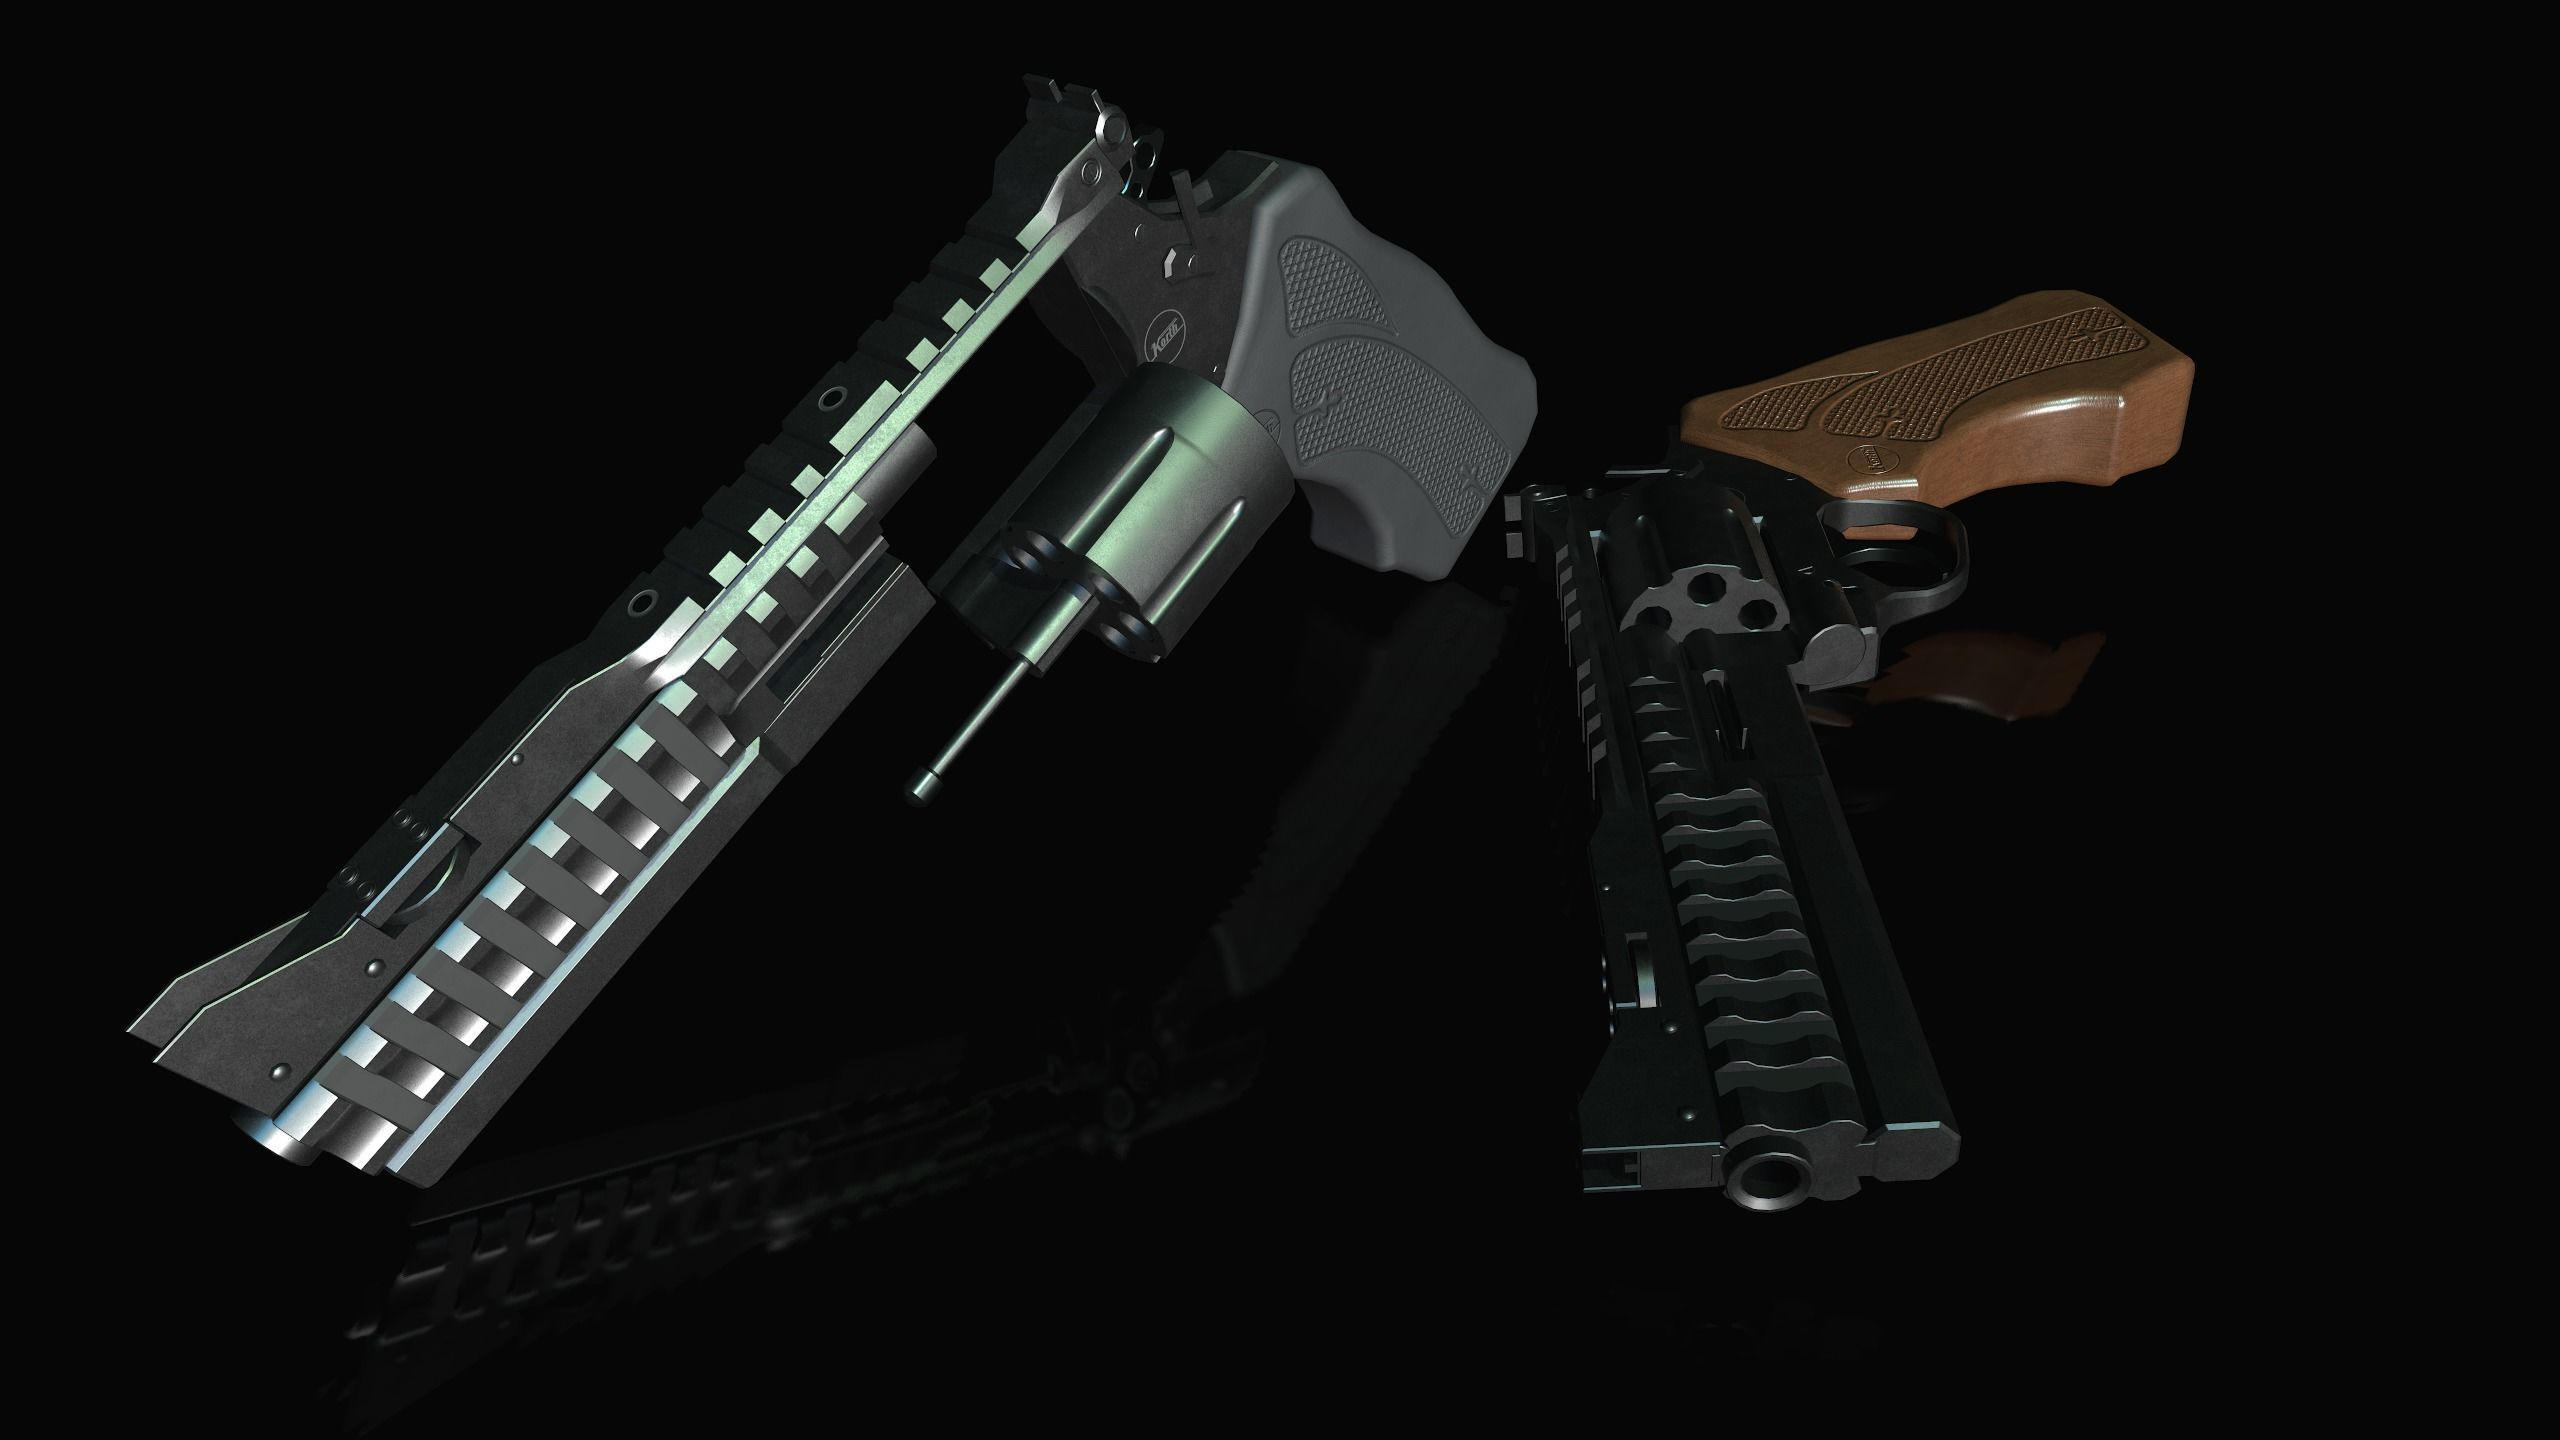 Korth national standard 357 Magnum